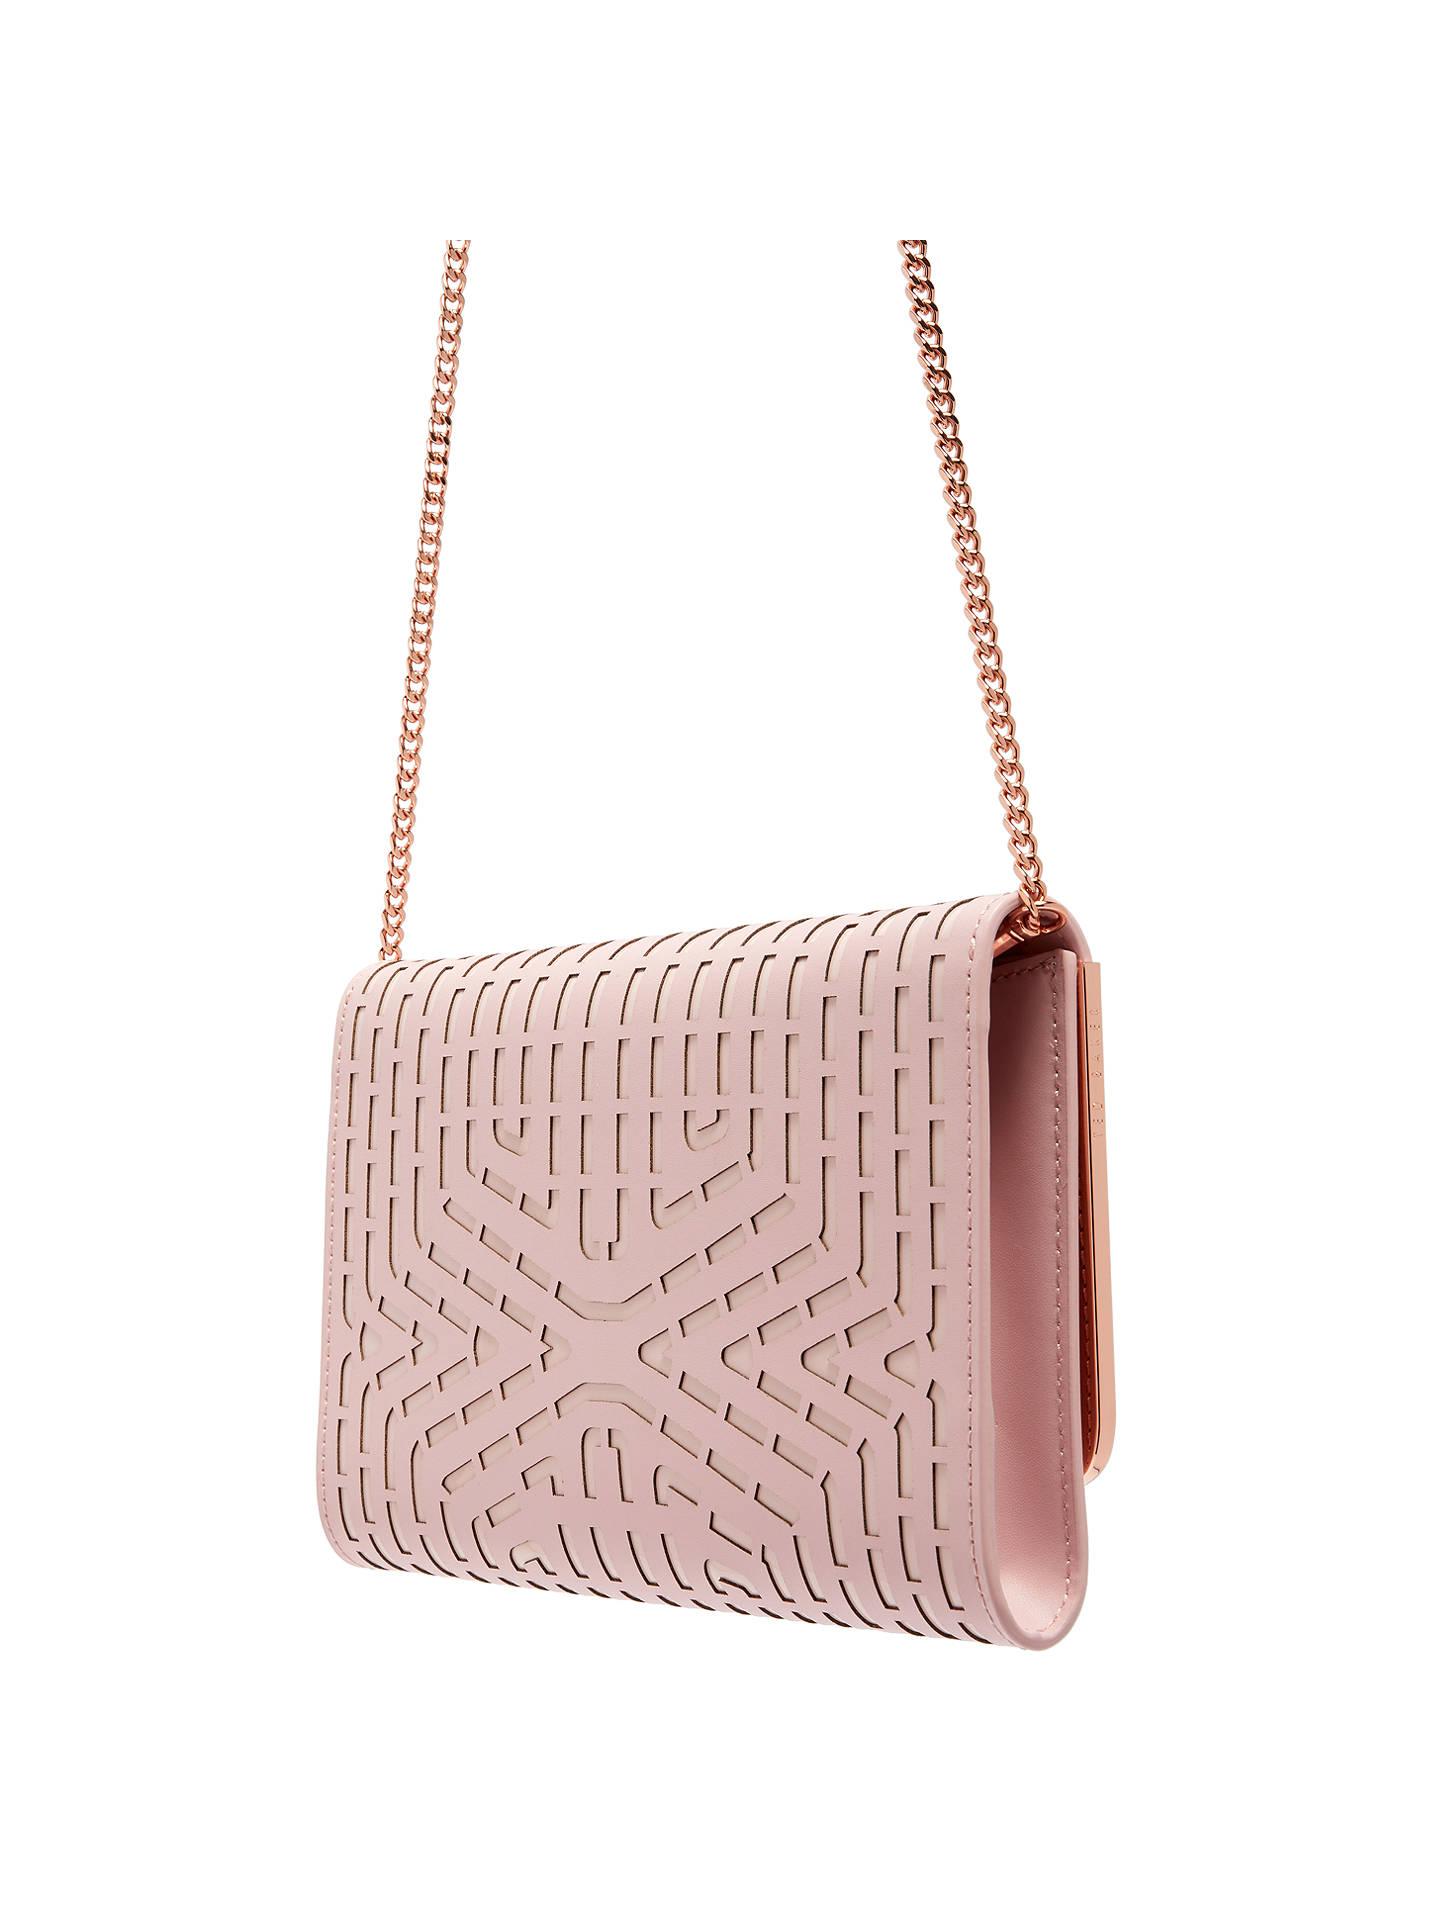 64a7b21ee8a8e ... Buy Ted Baker Bree Clutch Bag